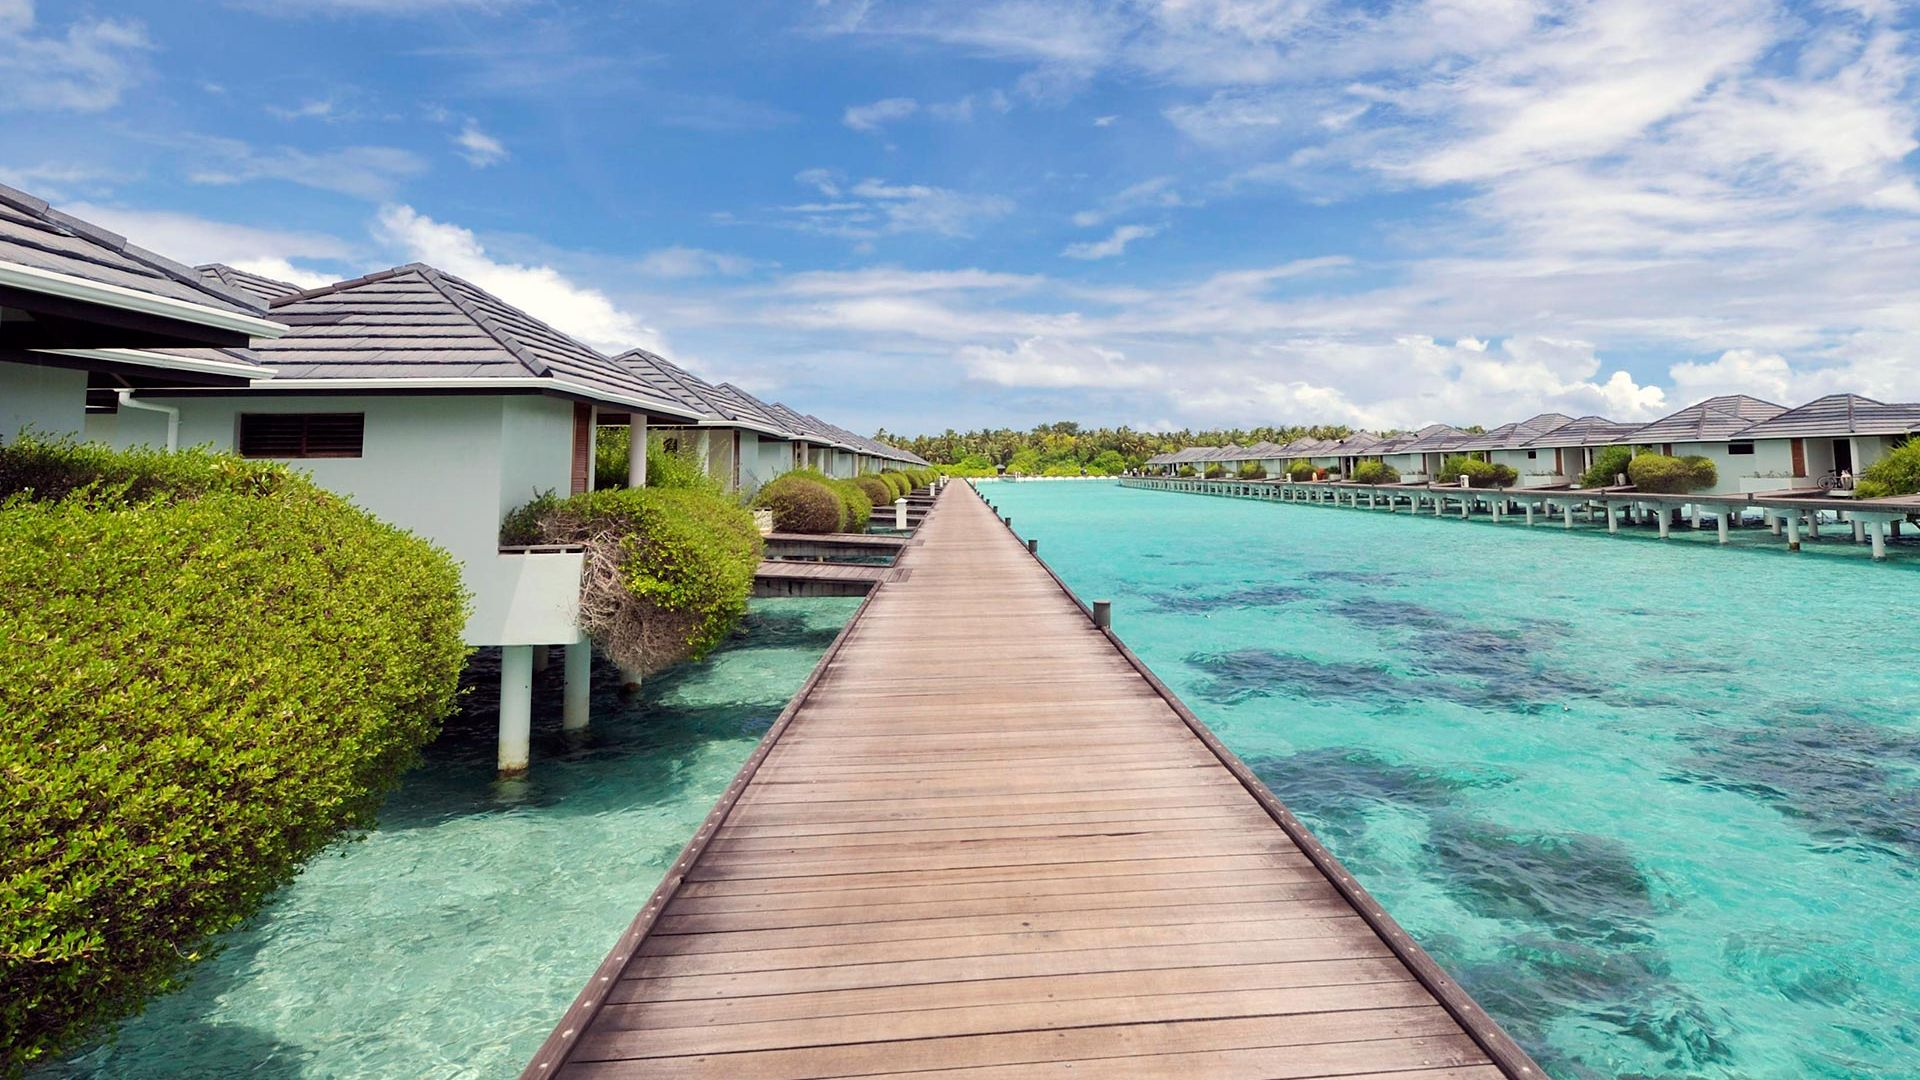 Sejur plaja Maldive, 12 zile - ianuarie 2022